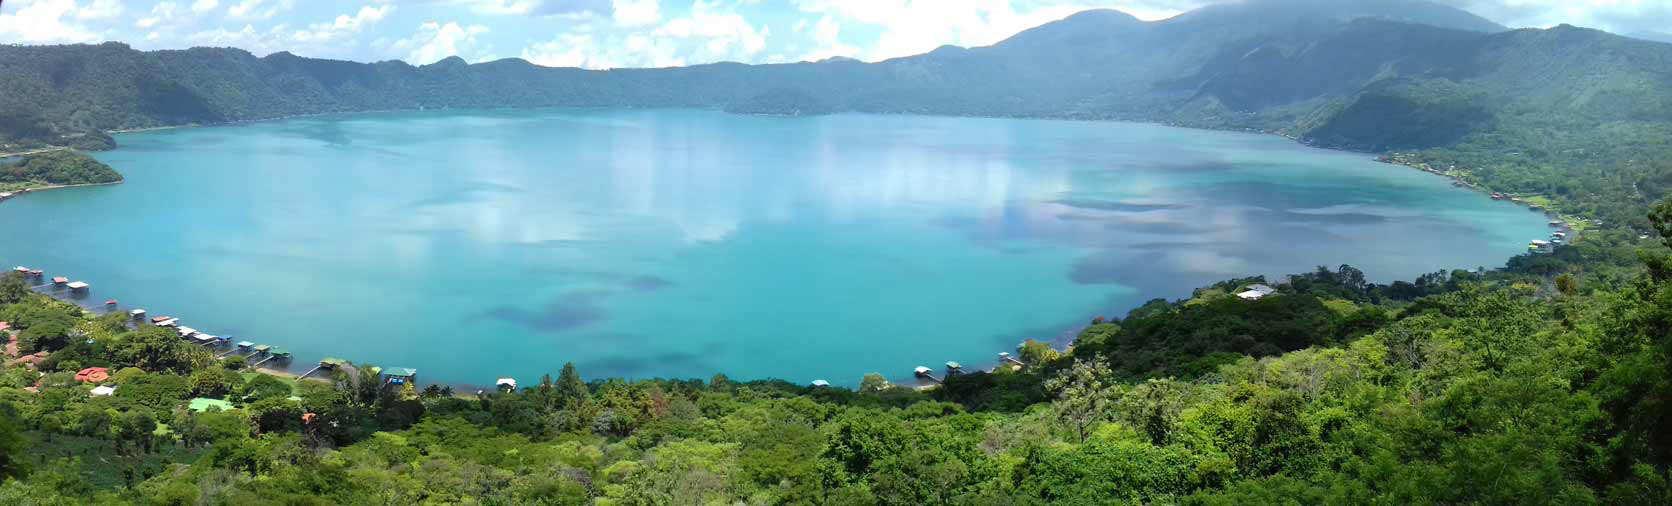 Lago-turquesa9